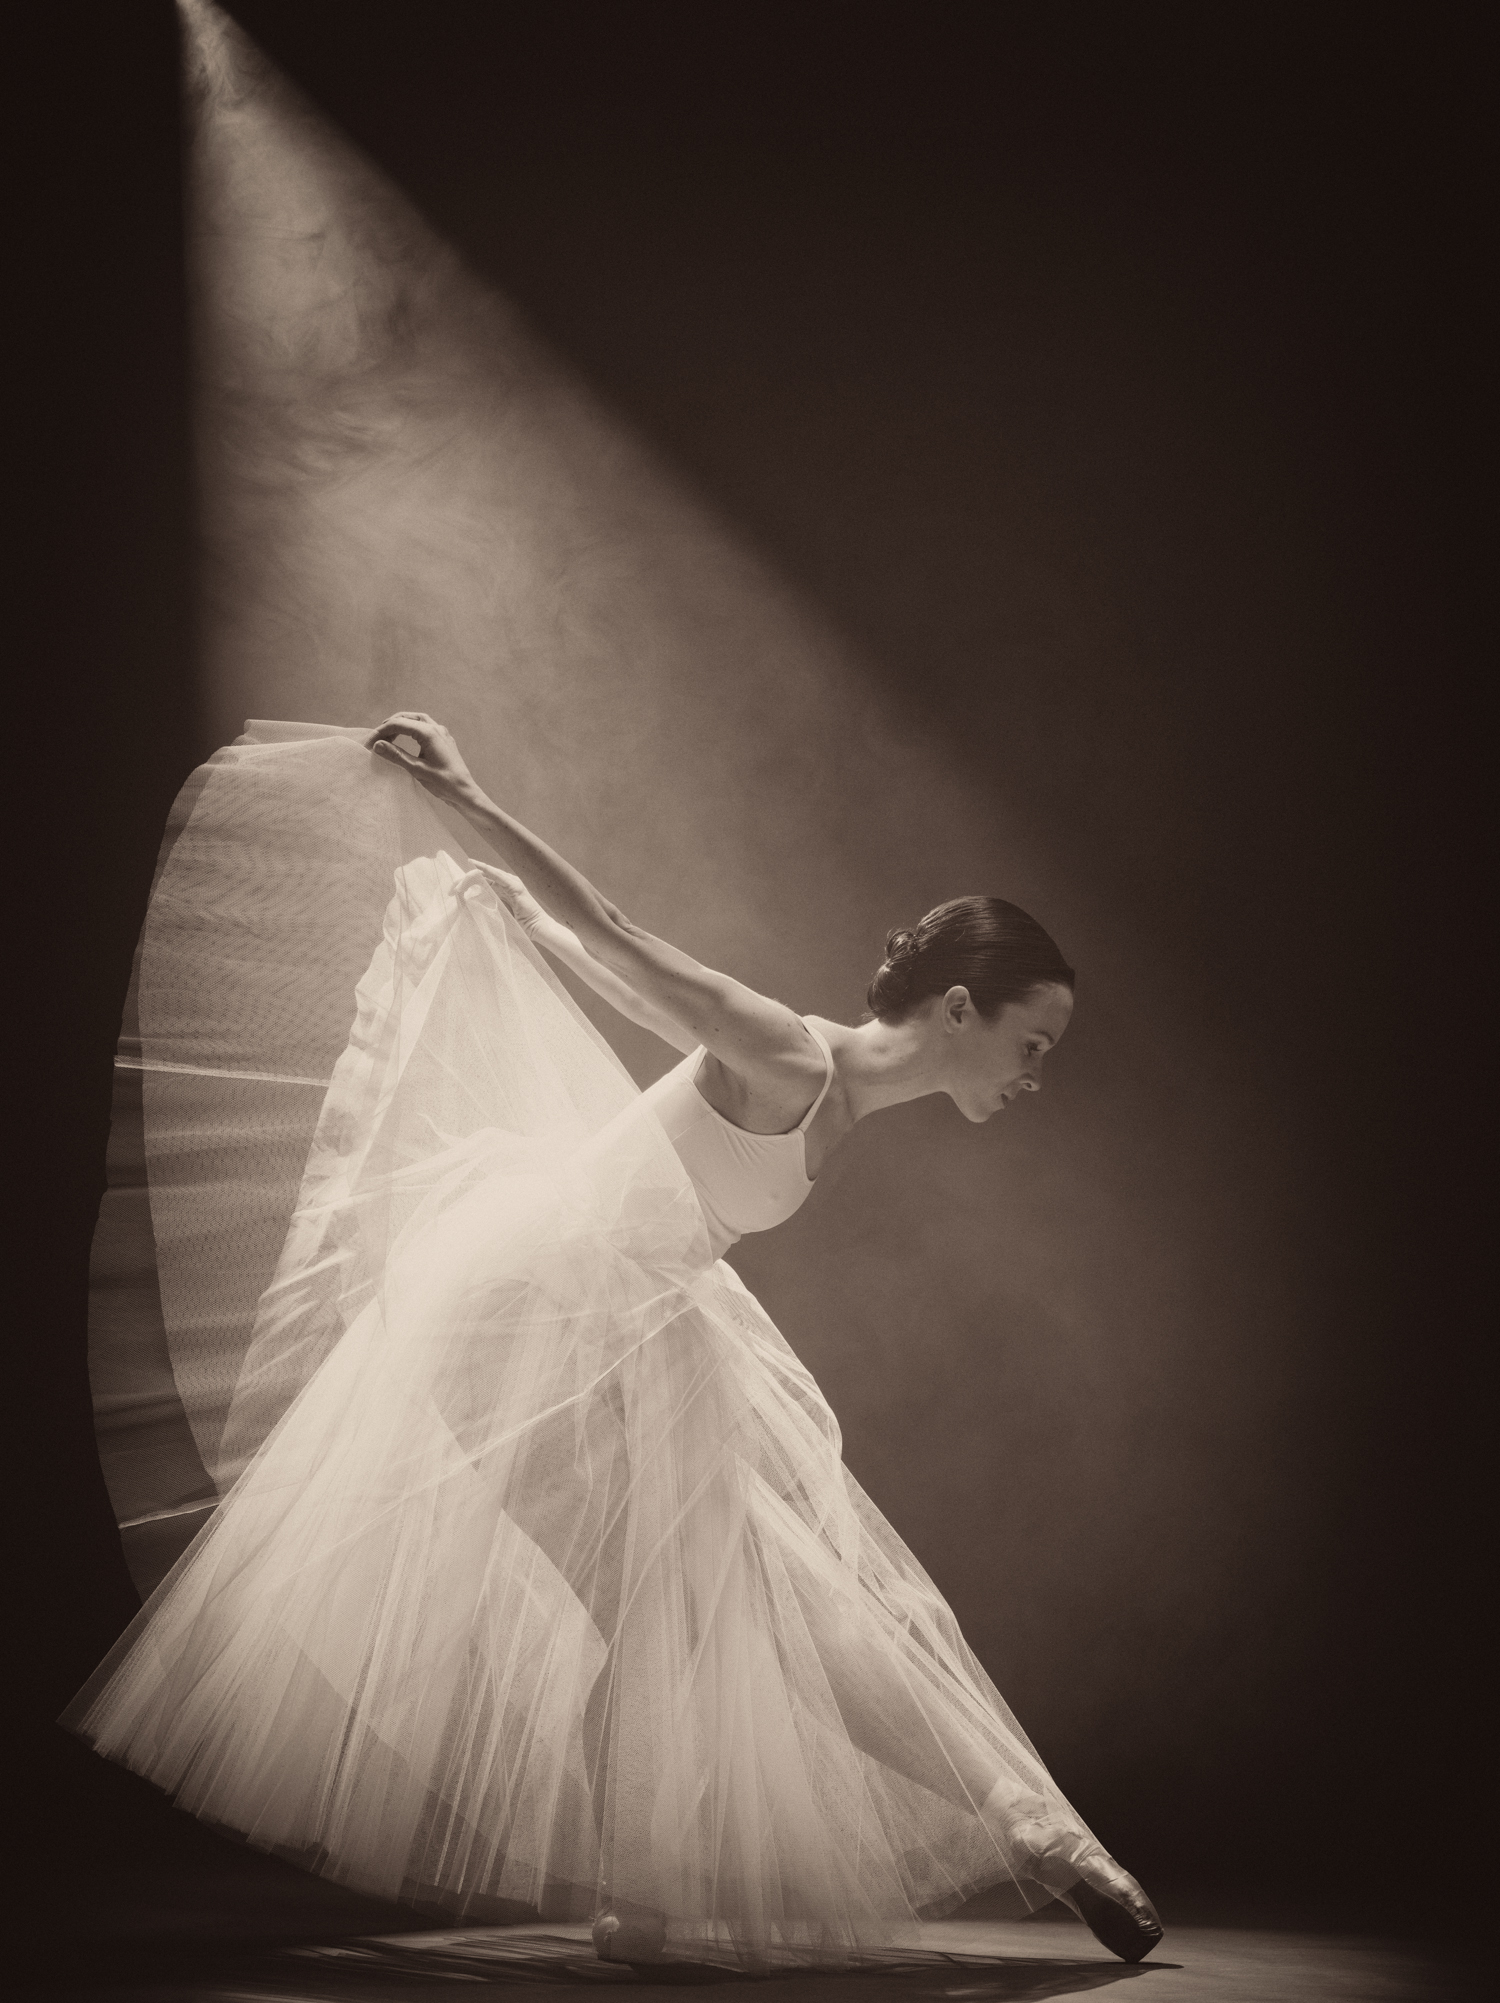 birnbach-dance_photo-20130129-9244.jpg